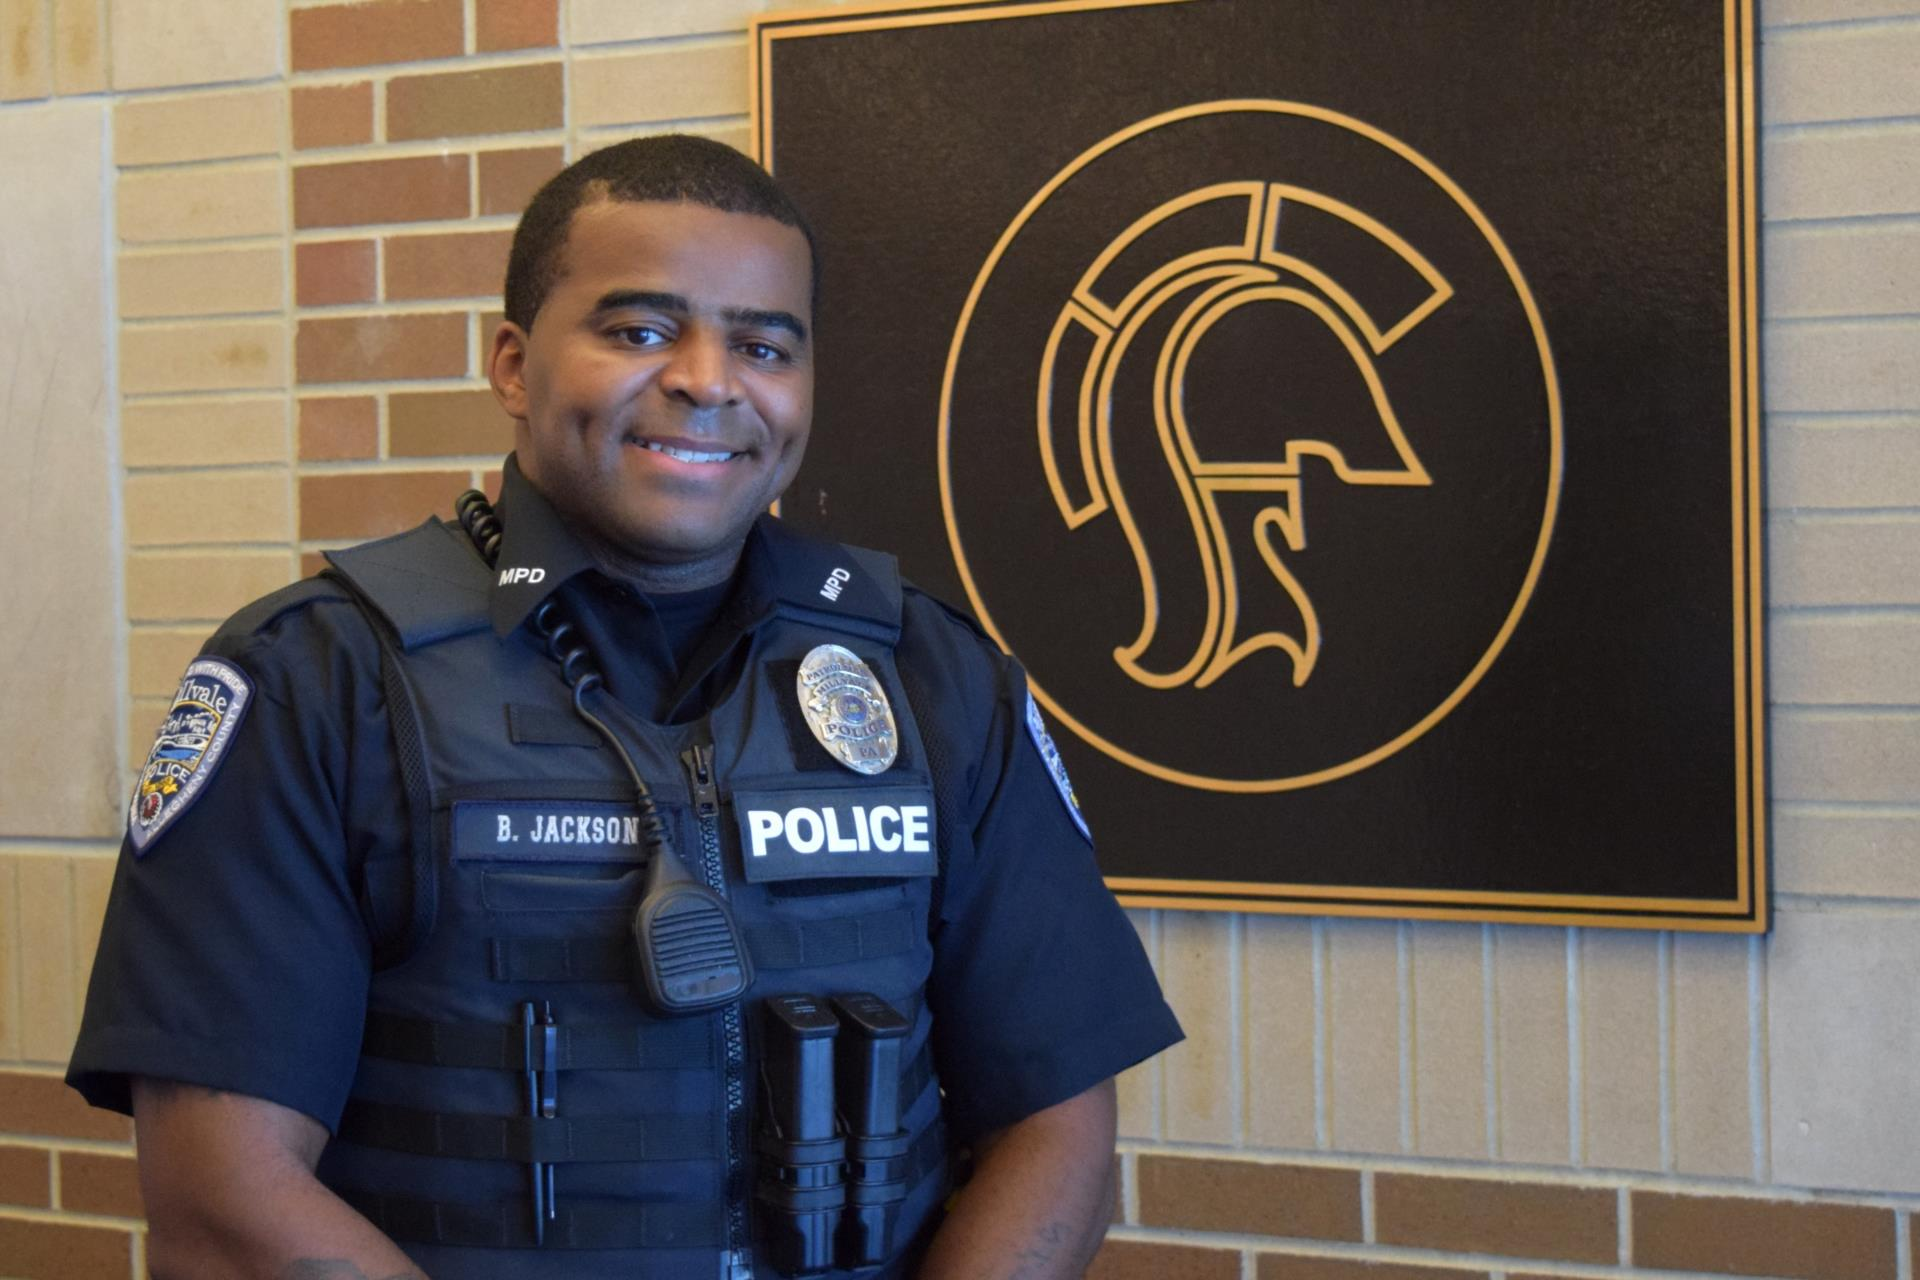 Officer Brenan Jackson